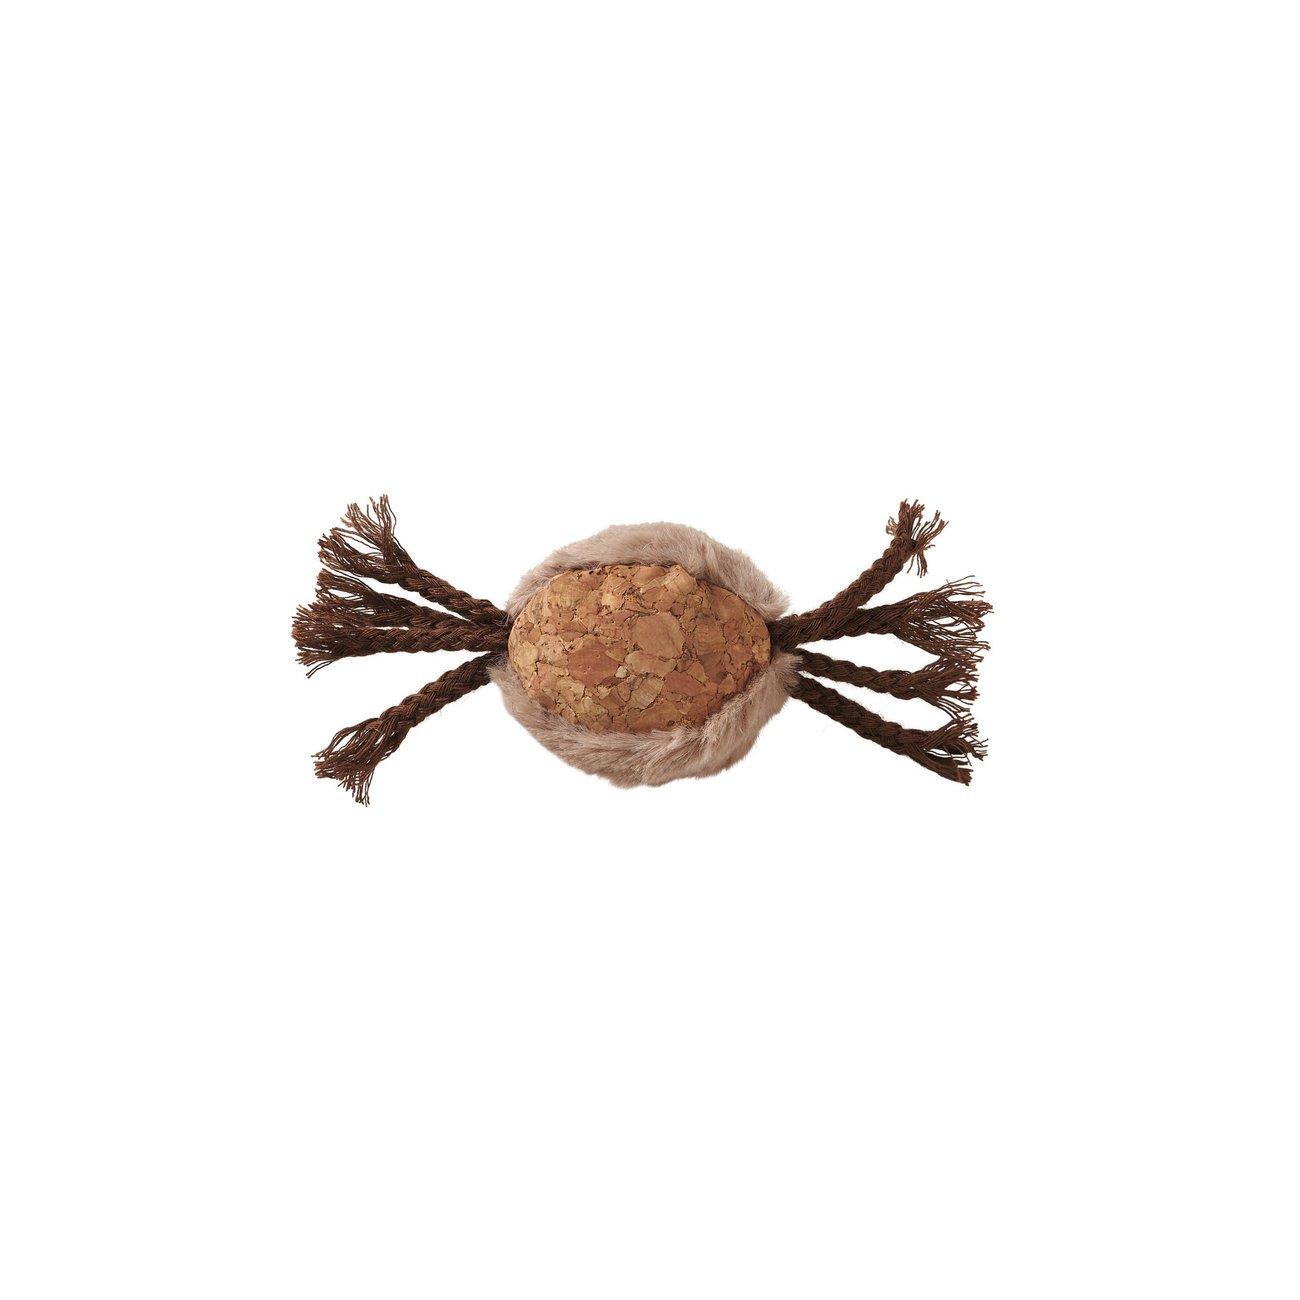 Hunter Katzenspielzeug Moa, Ball, 13 cm